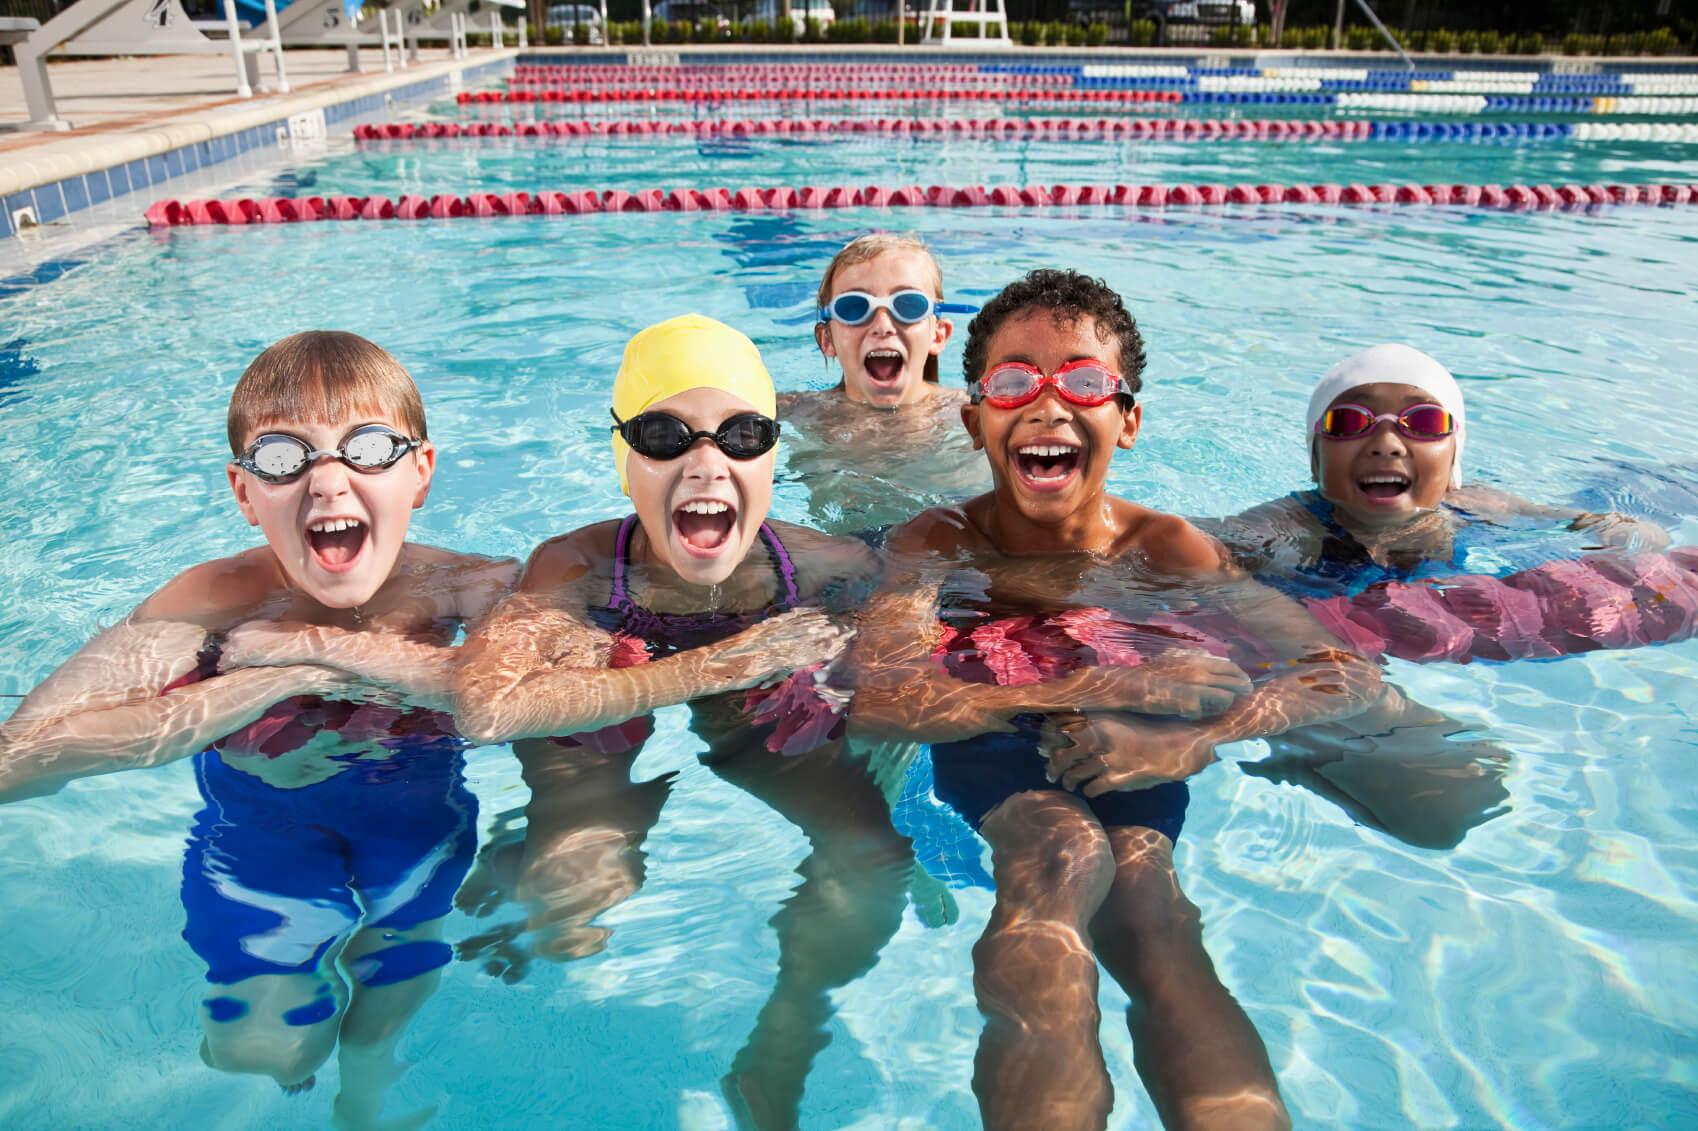 Group of multi-ethnic children having fun in swimming pool.